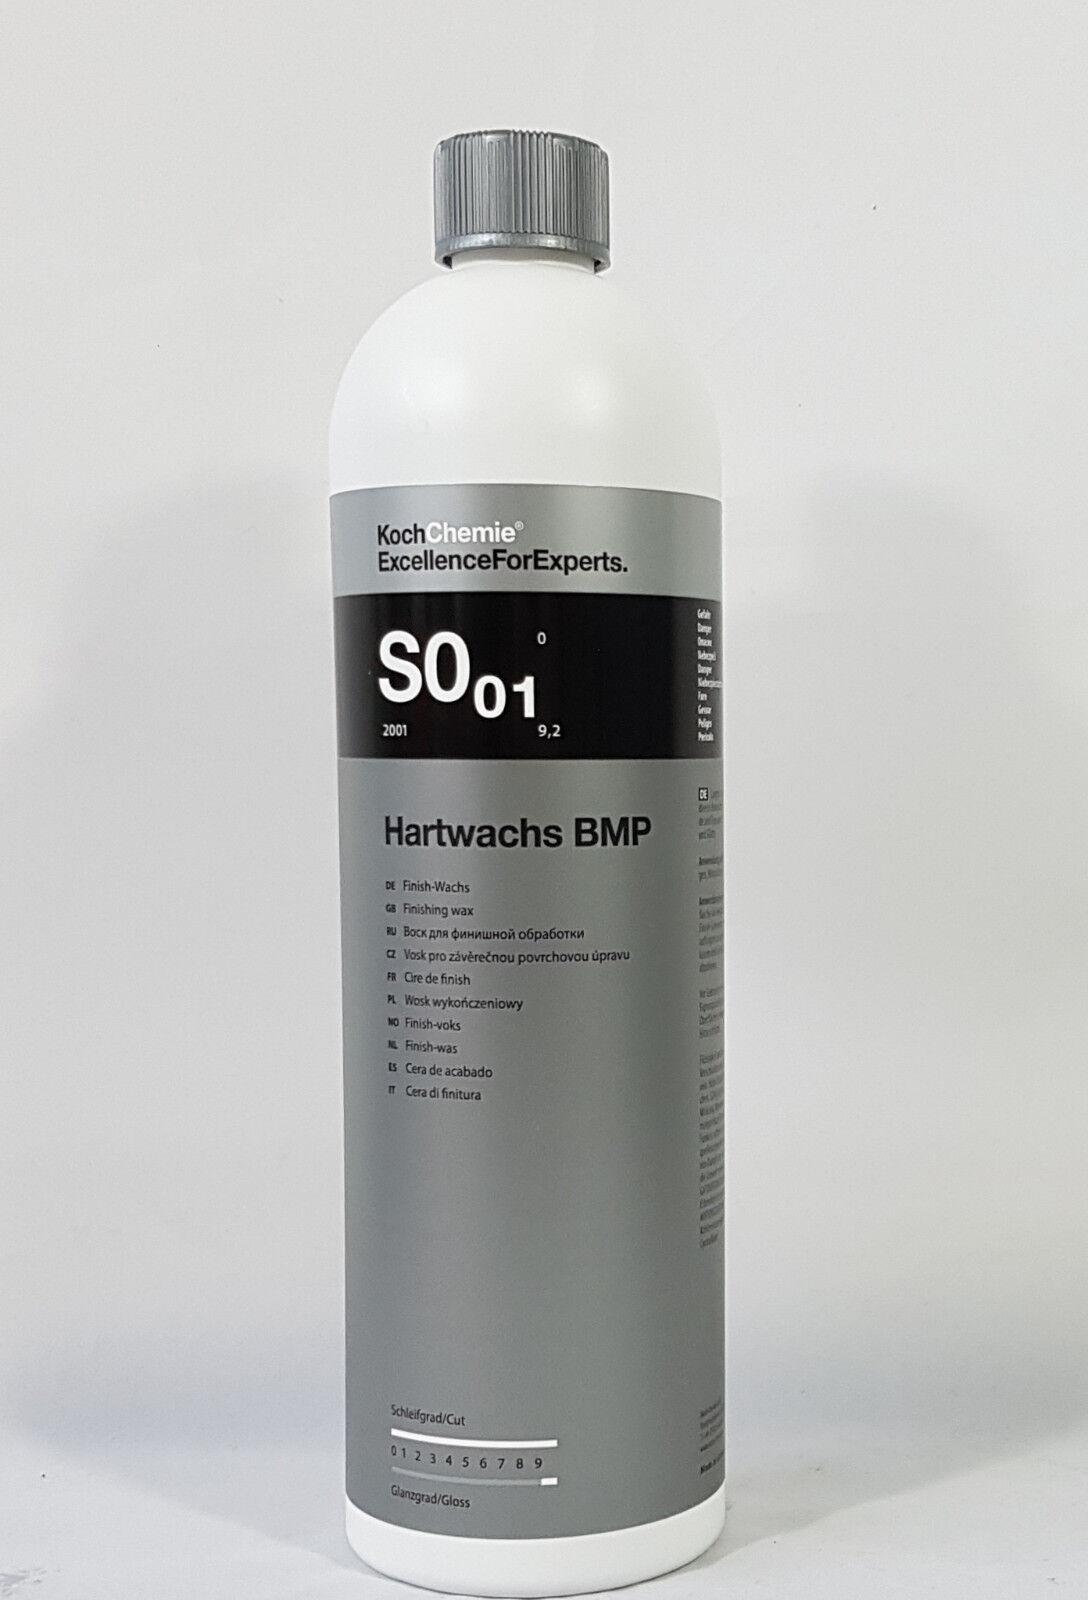 Koch Chemie SO.01 Hartwachs BMP Finish Wax 1L.